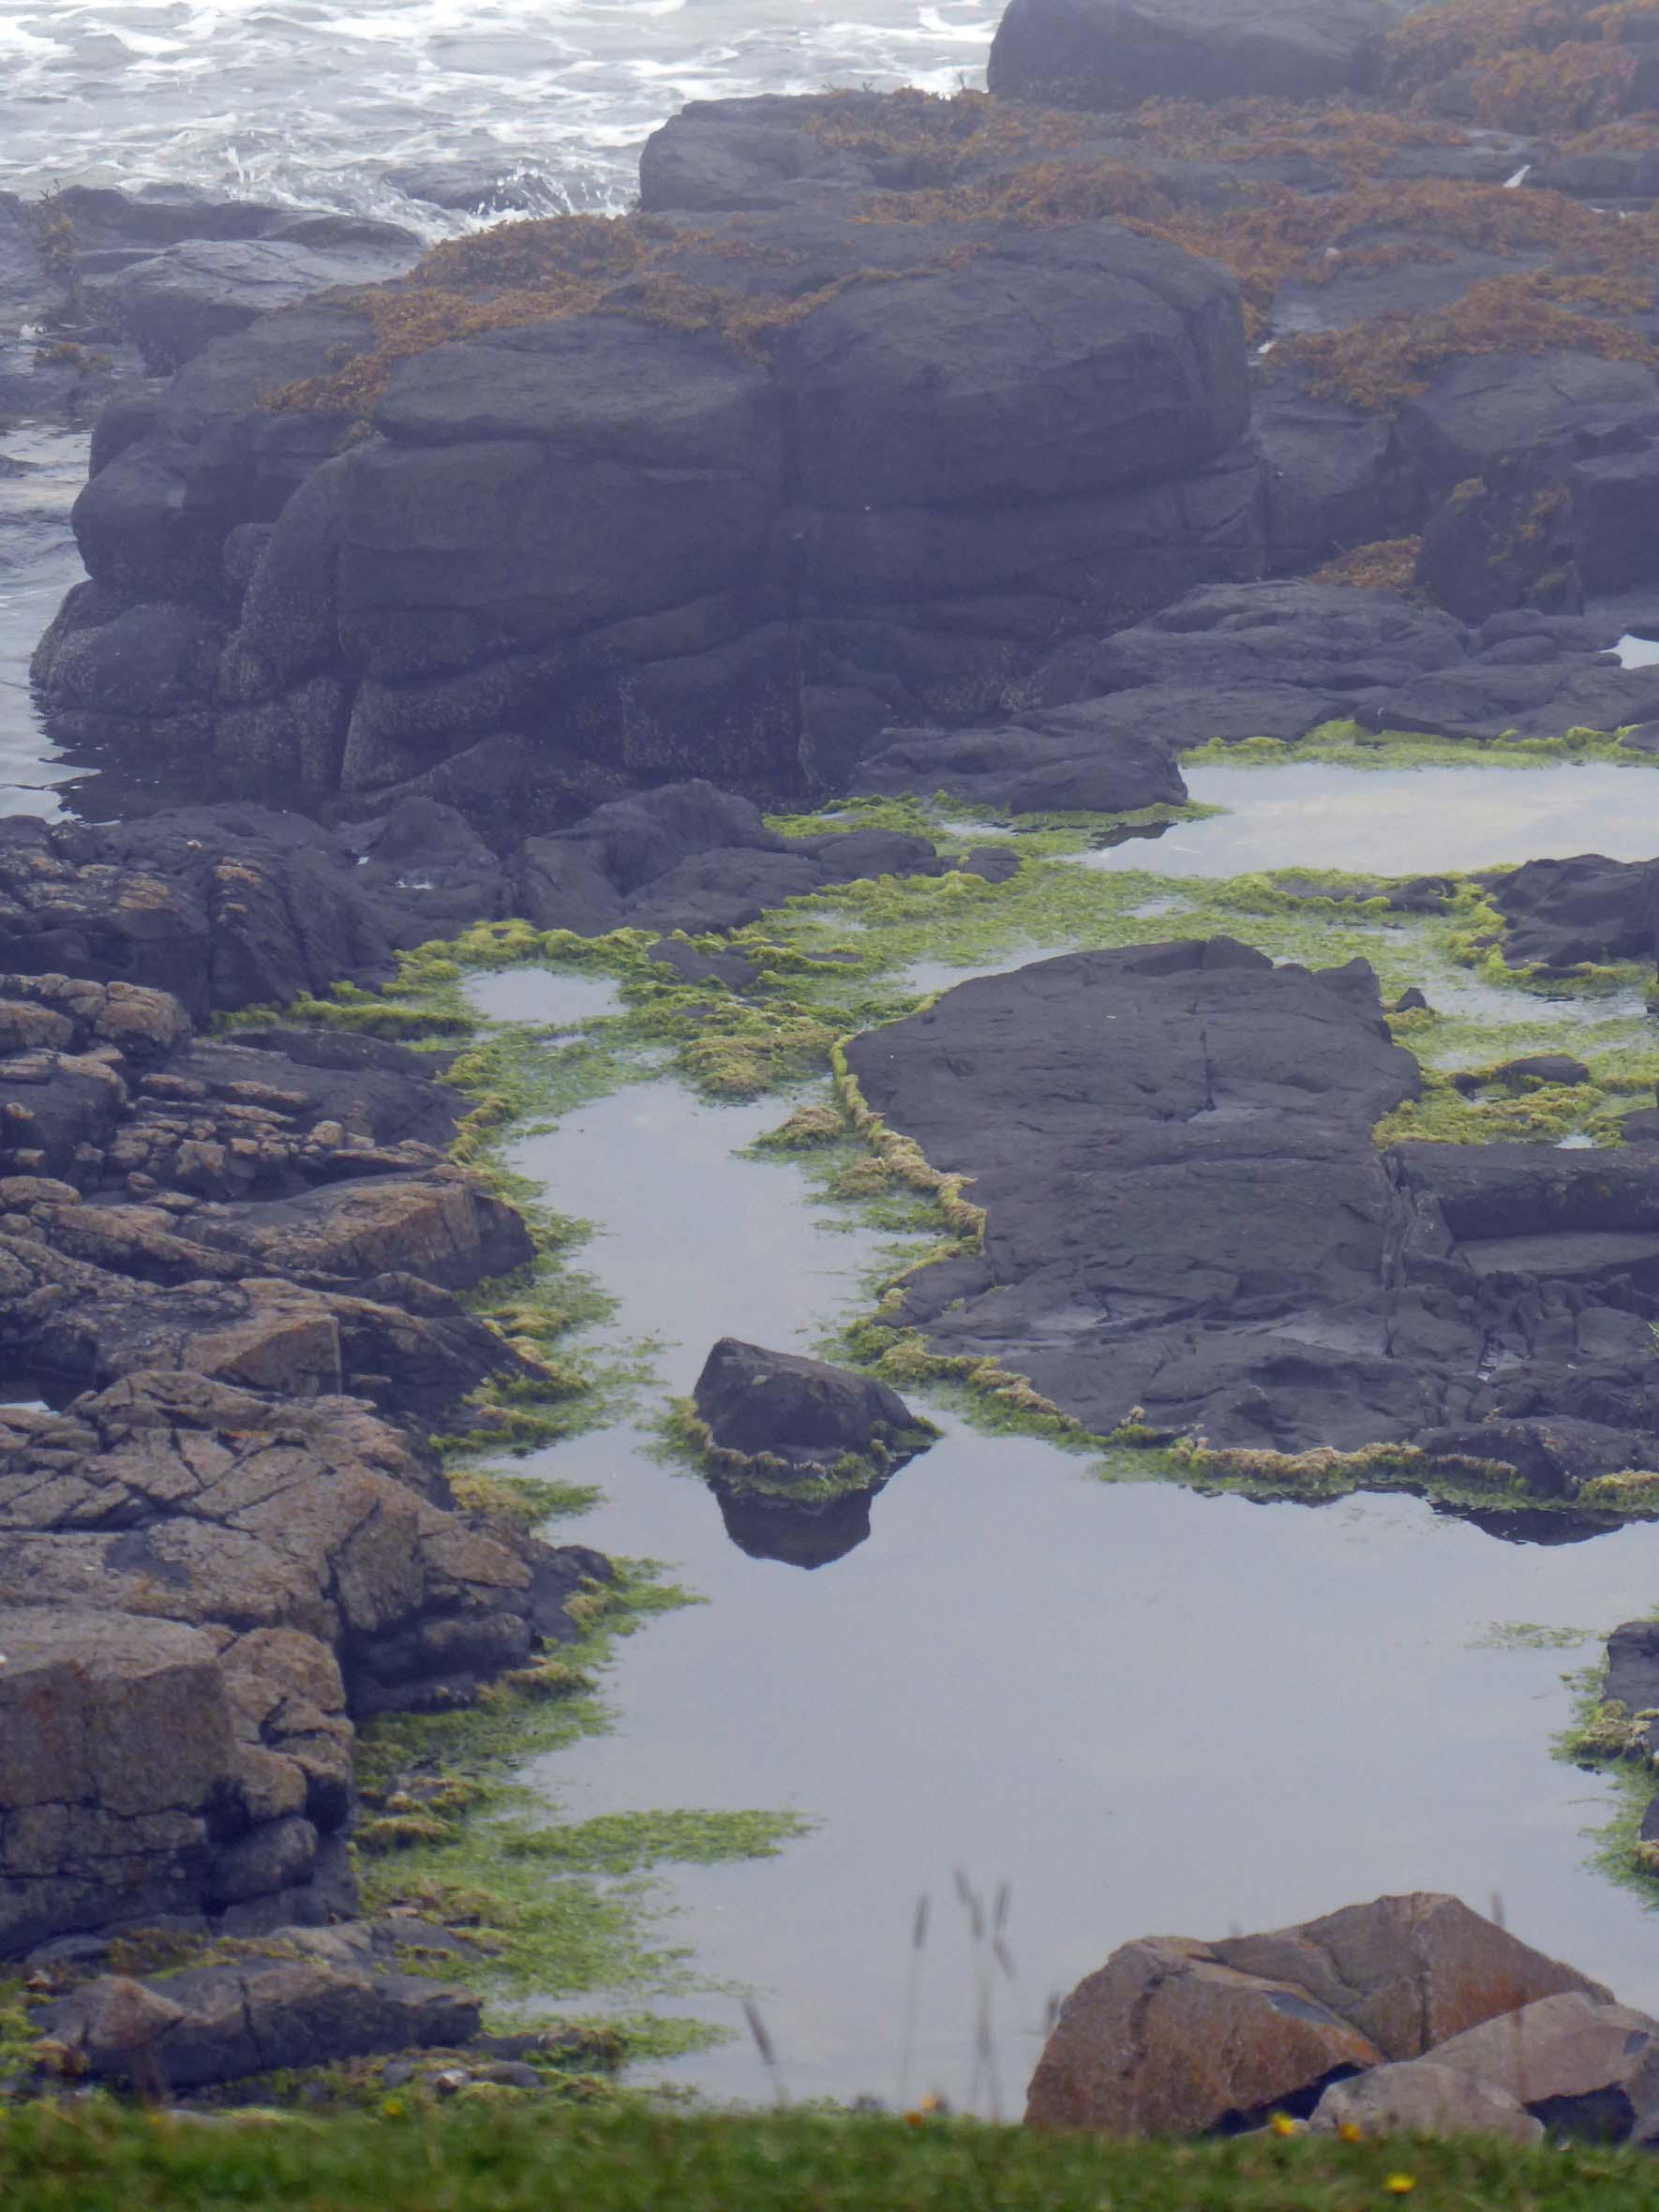 Rock pools edged with green seaweed